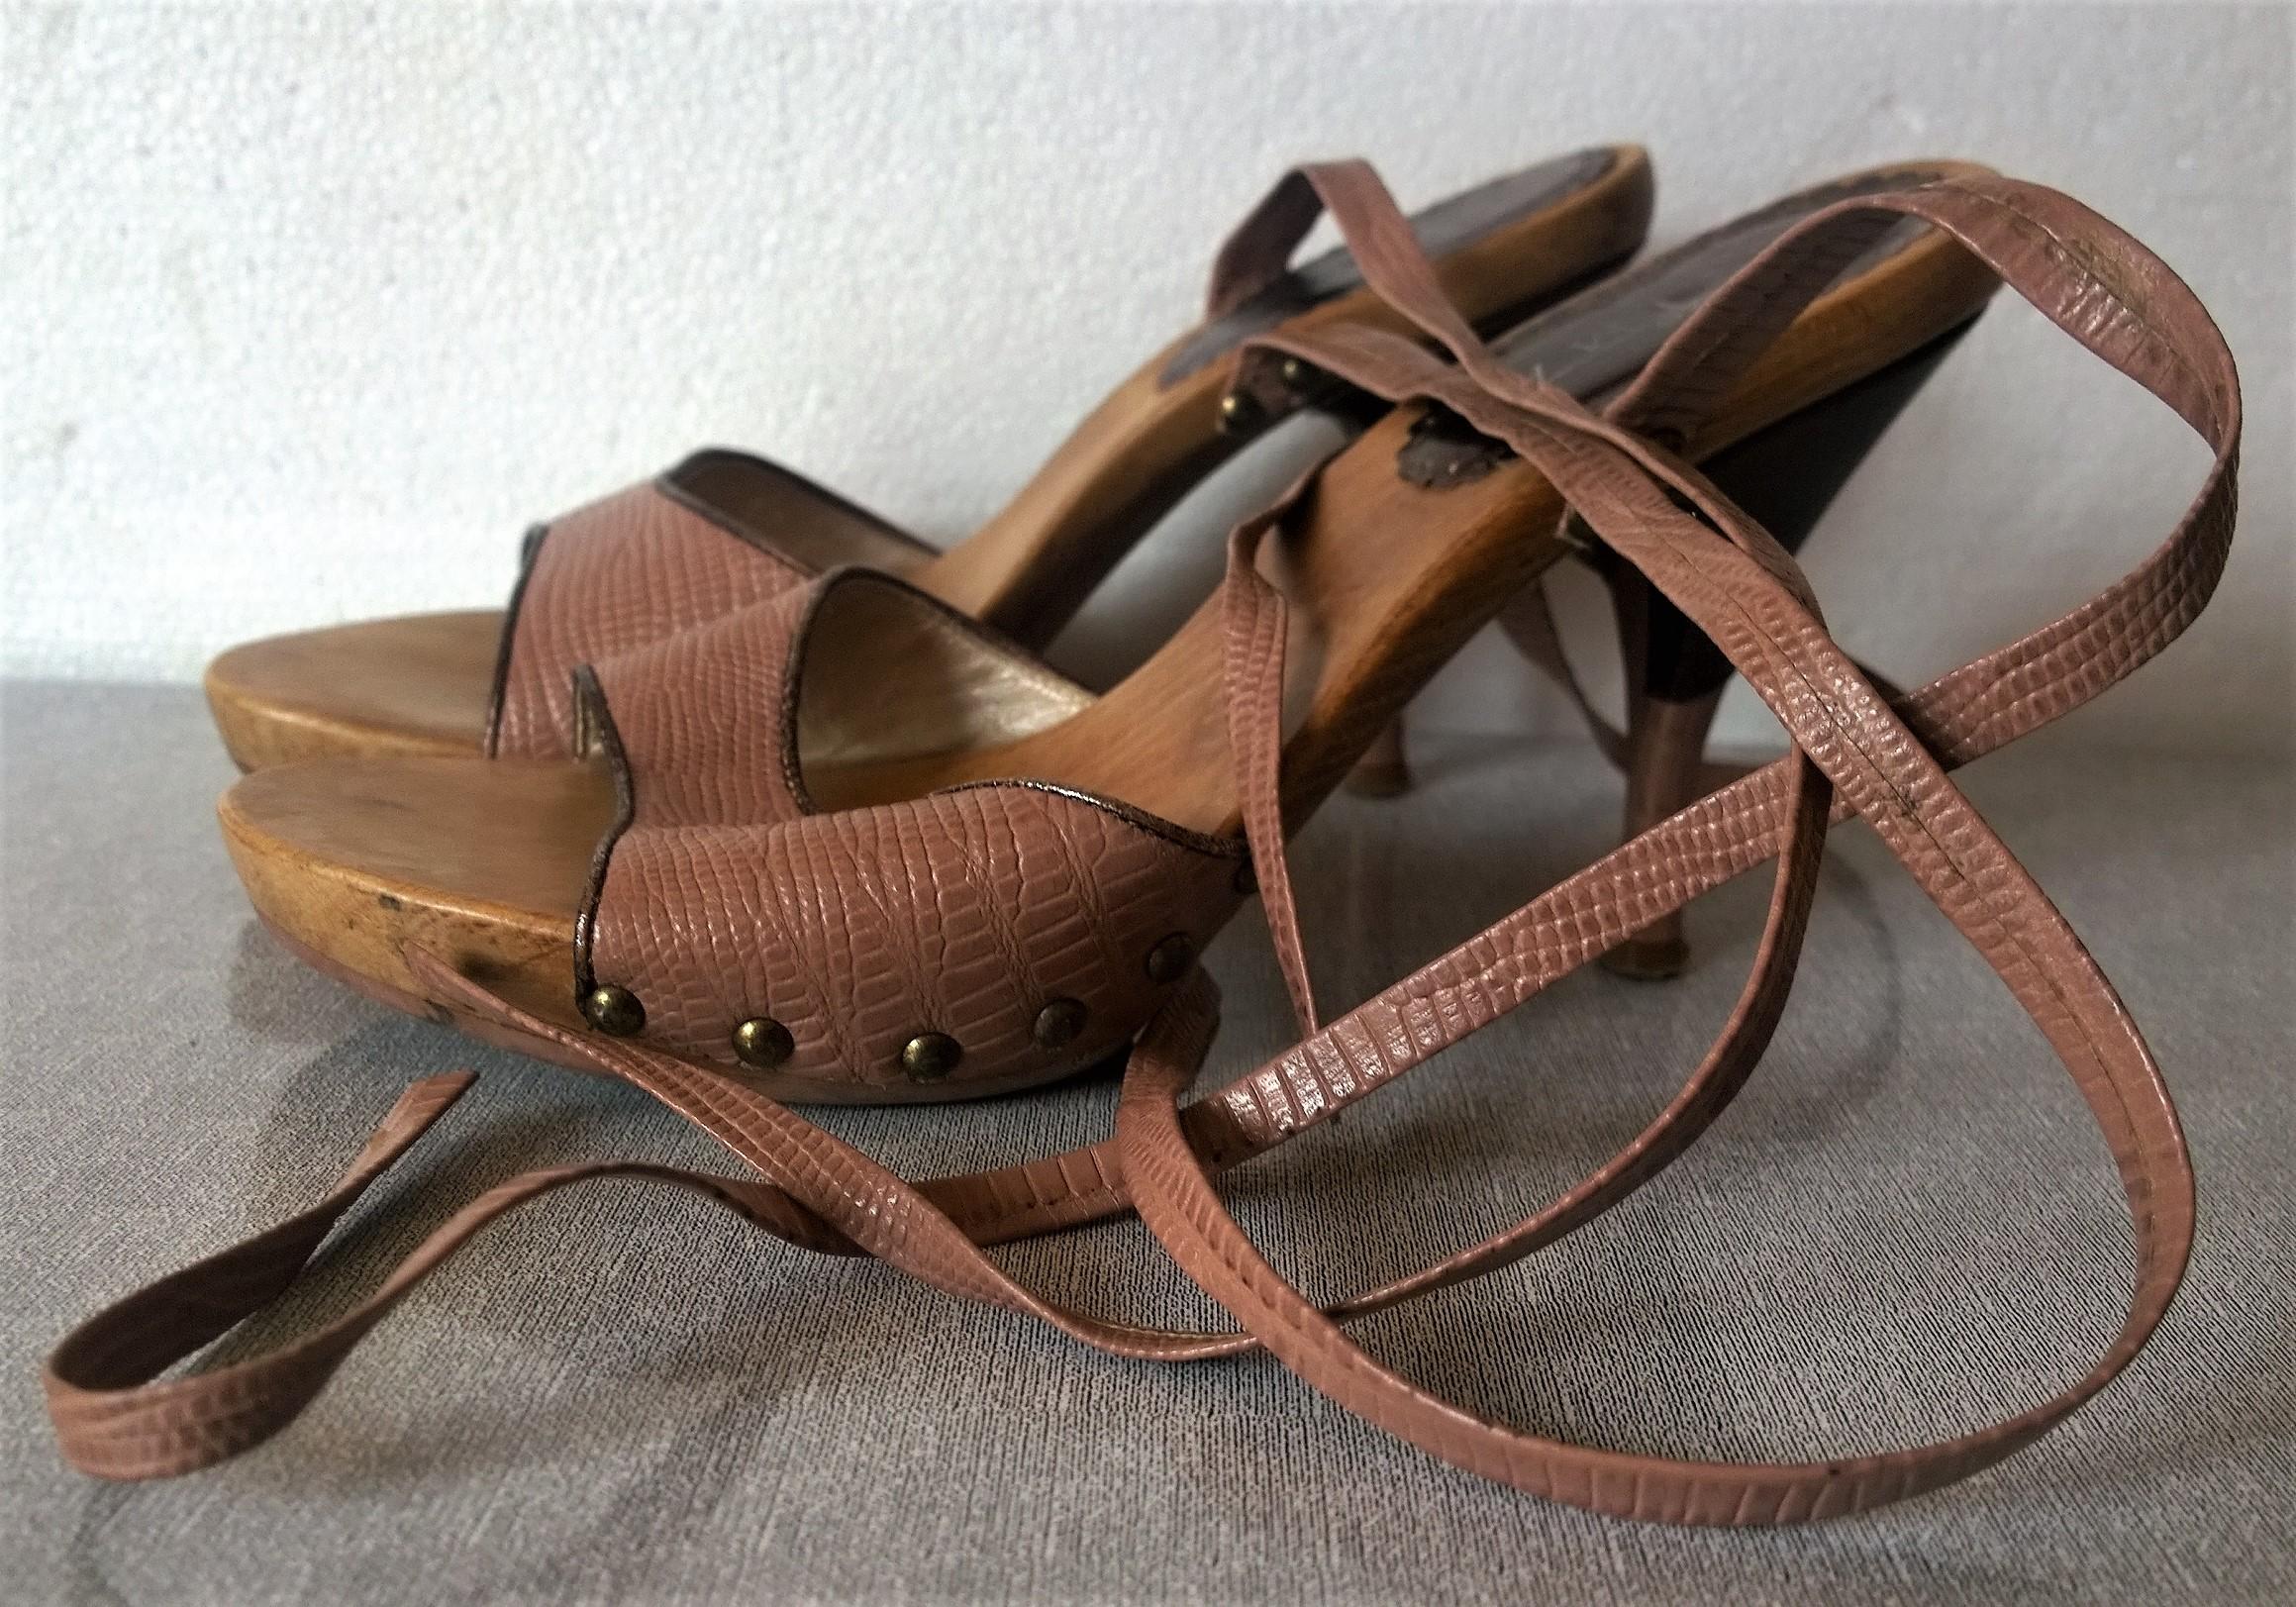 buty RYŁKO 37 skóra naturalna+drewno wiązane fiole